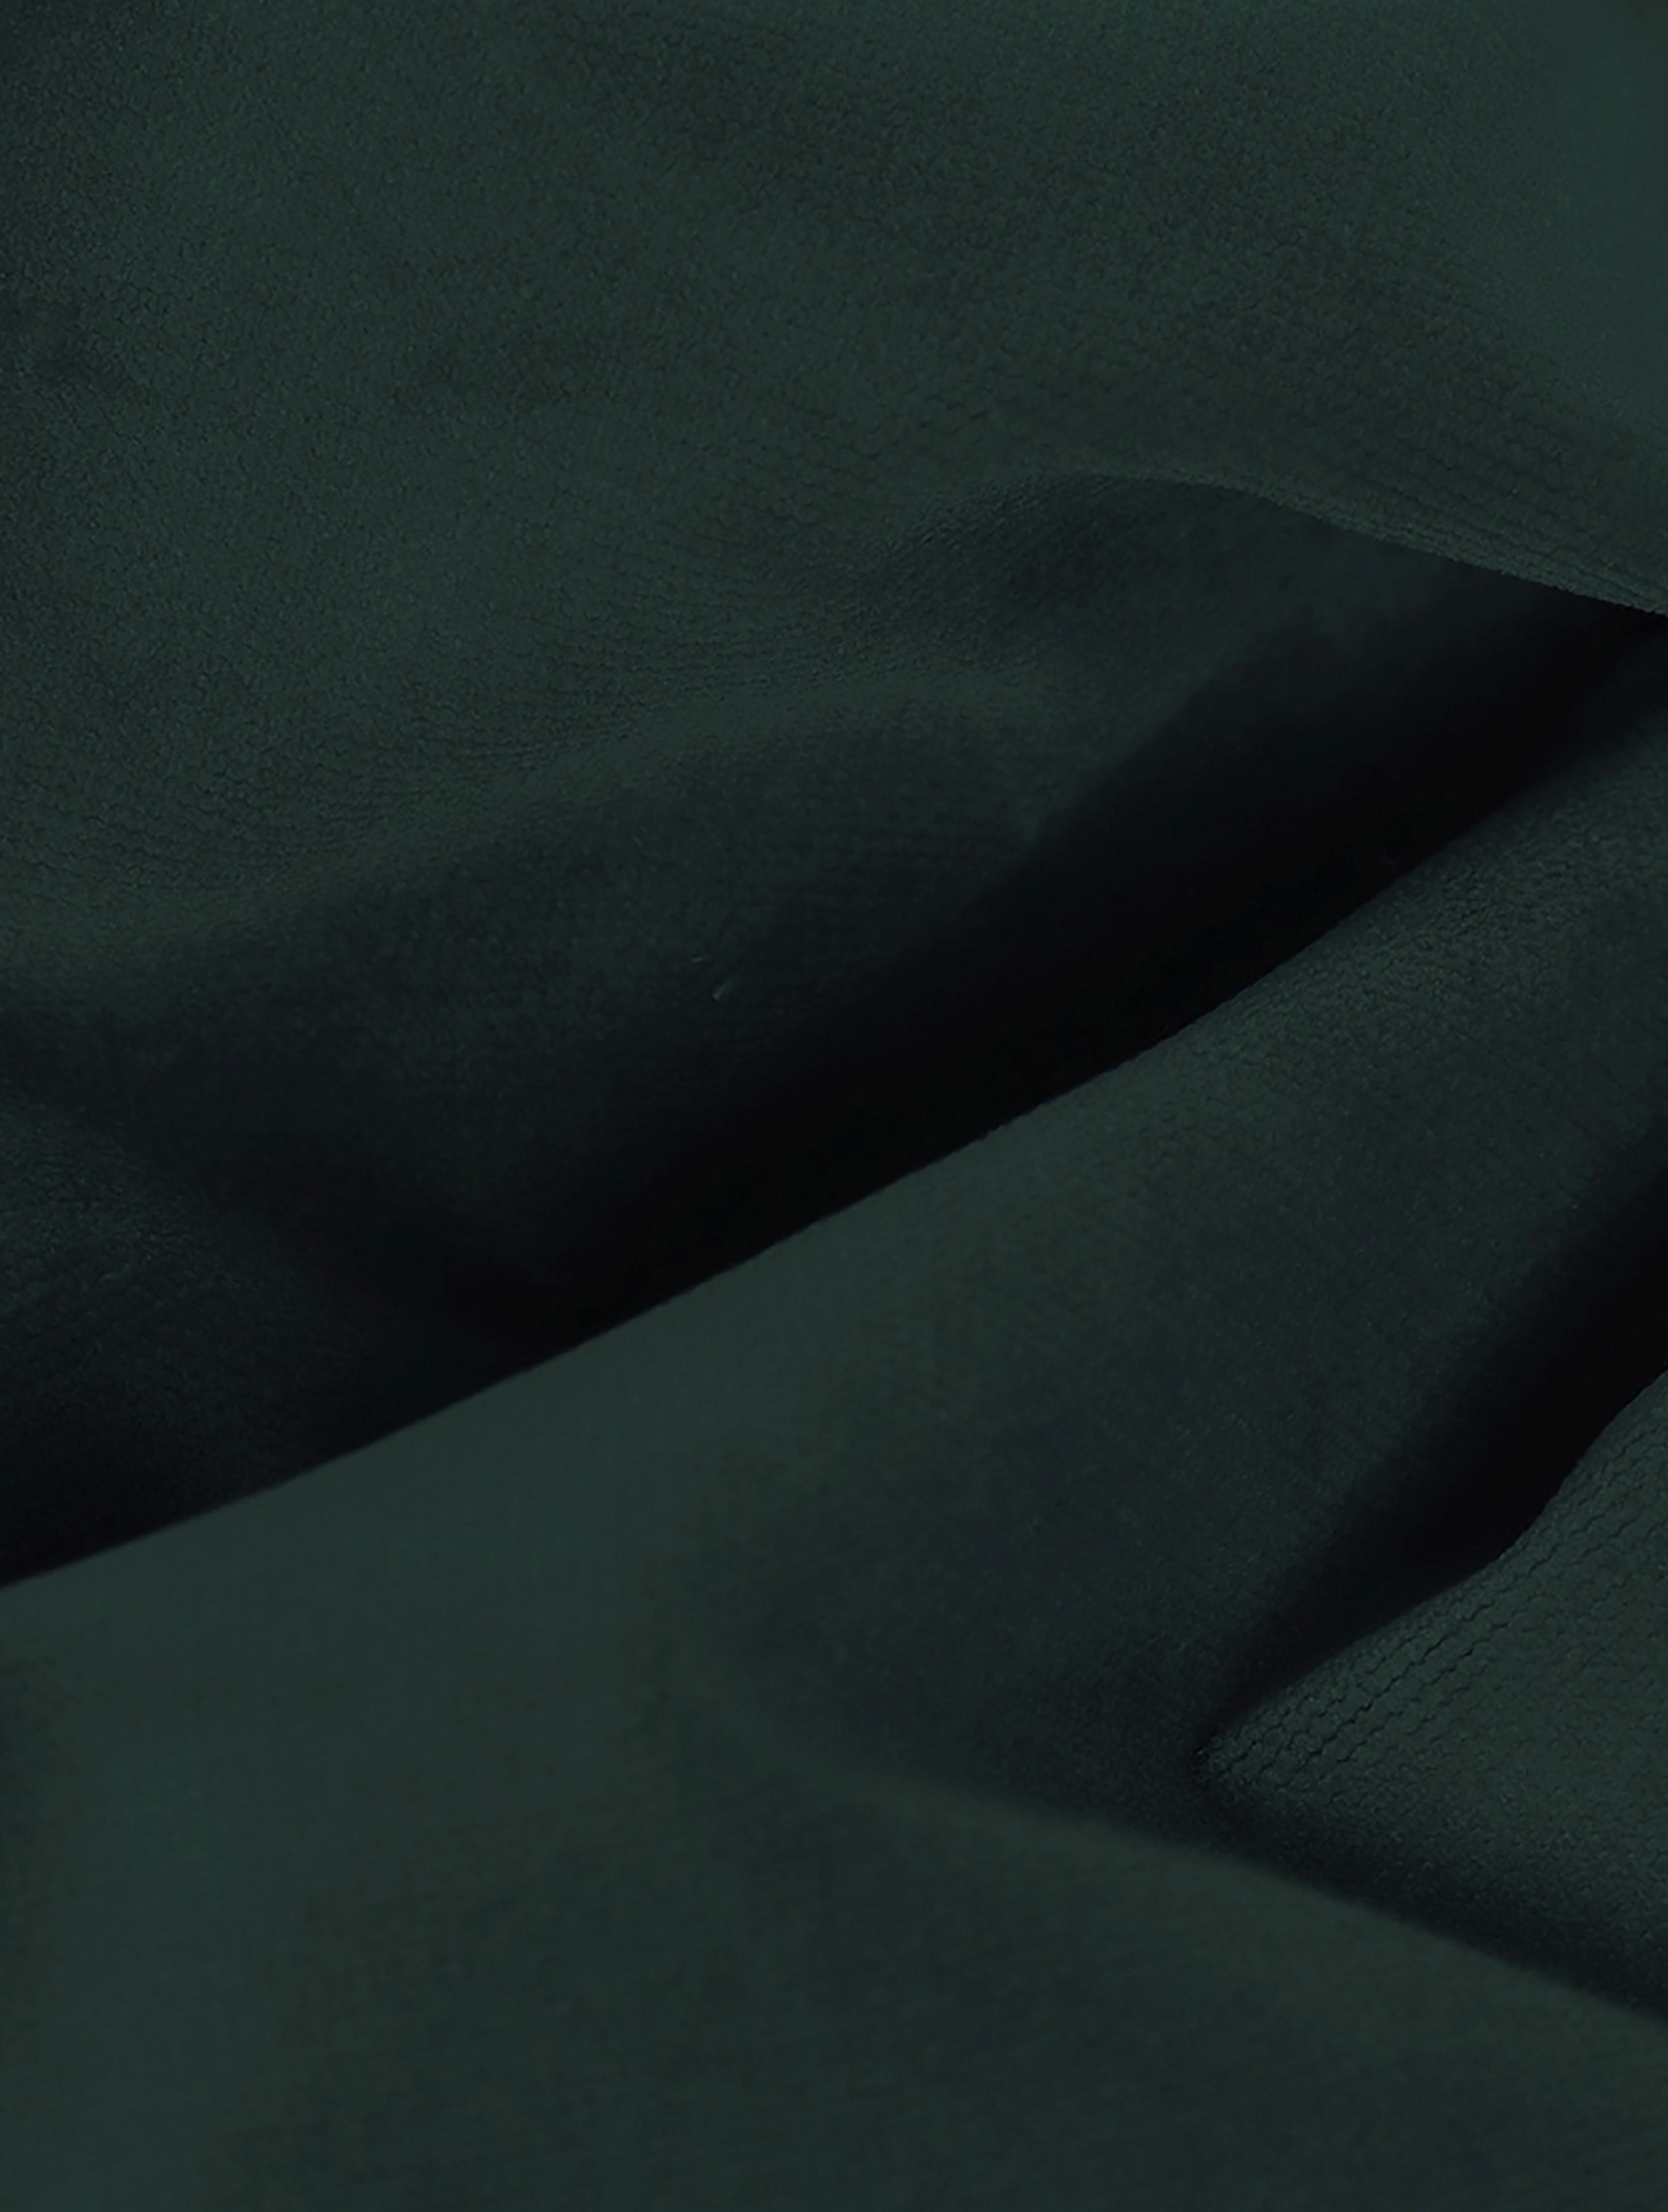 Sofa-Hocker Moby aus Samt, Bezug: Samt (Hochwertiger Polyes, Gestell: Massives Kiefernholz, Füße: Metall, pulverbeschichtet, Samt Dunkelgrün, 78 x 48 cm